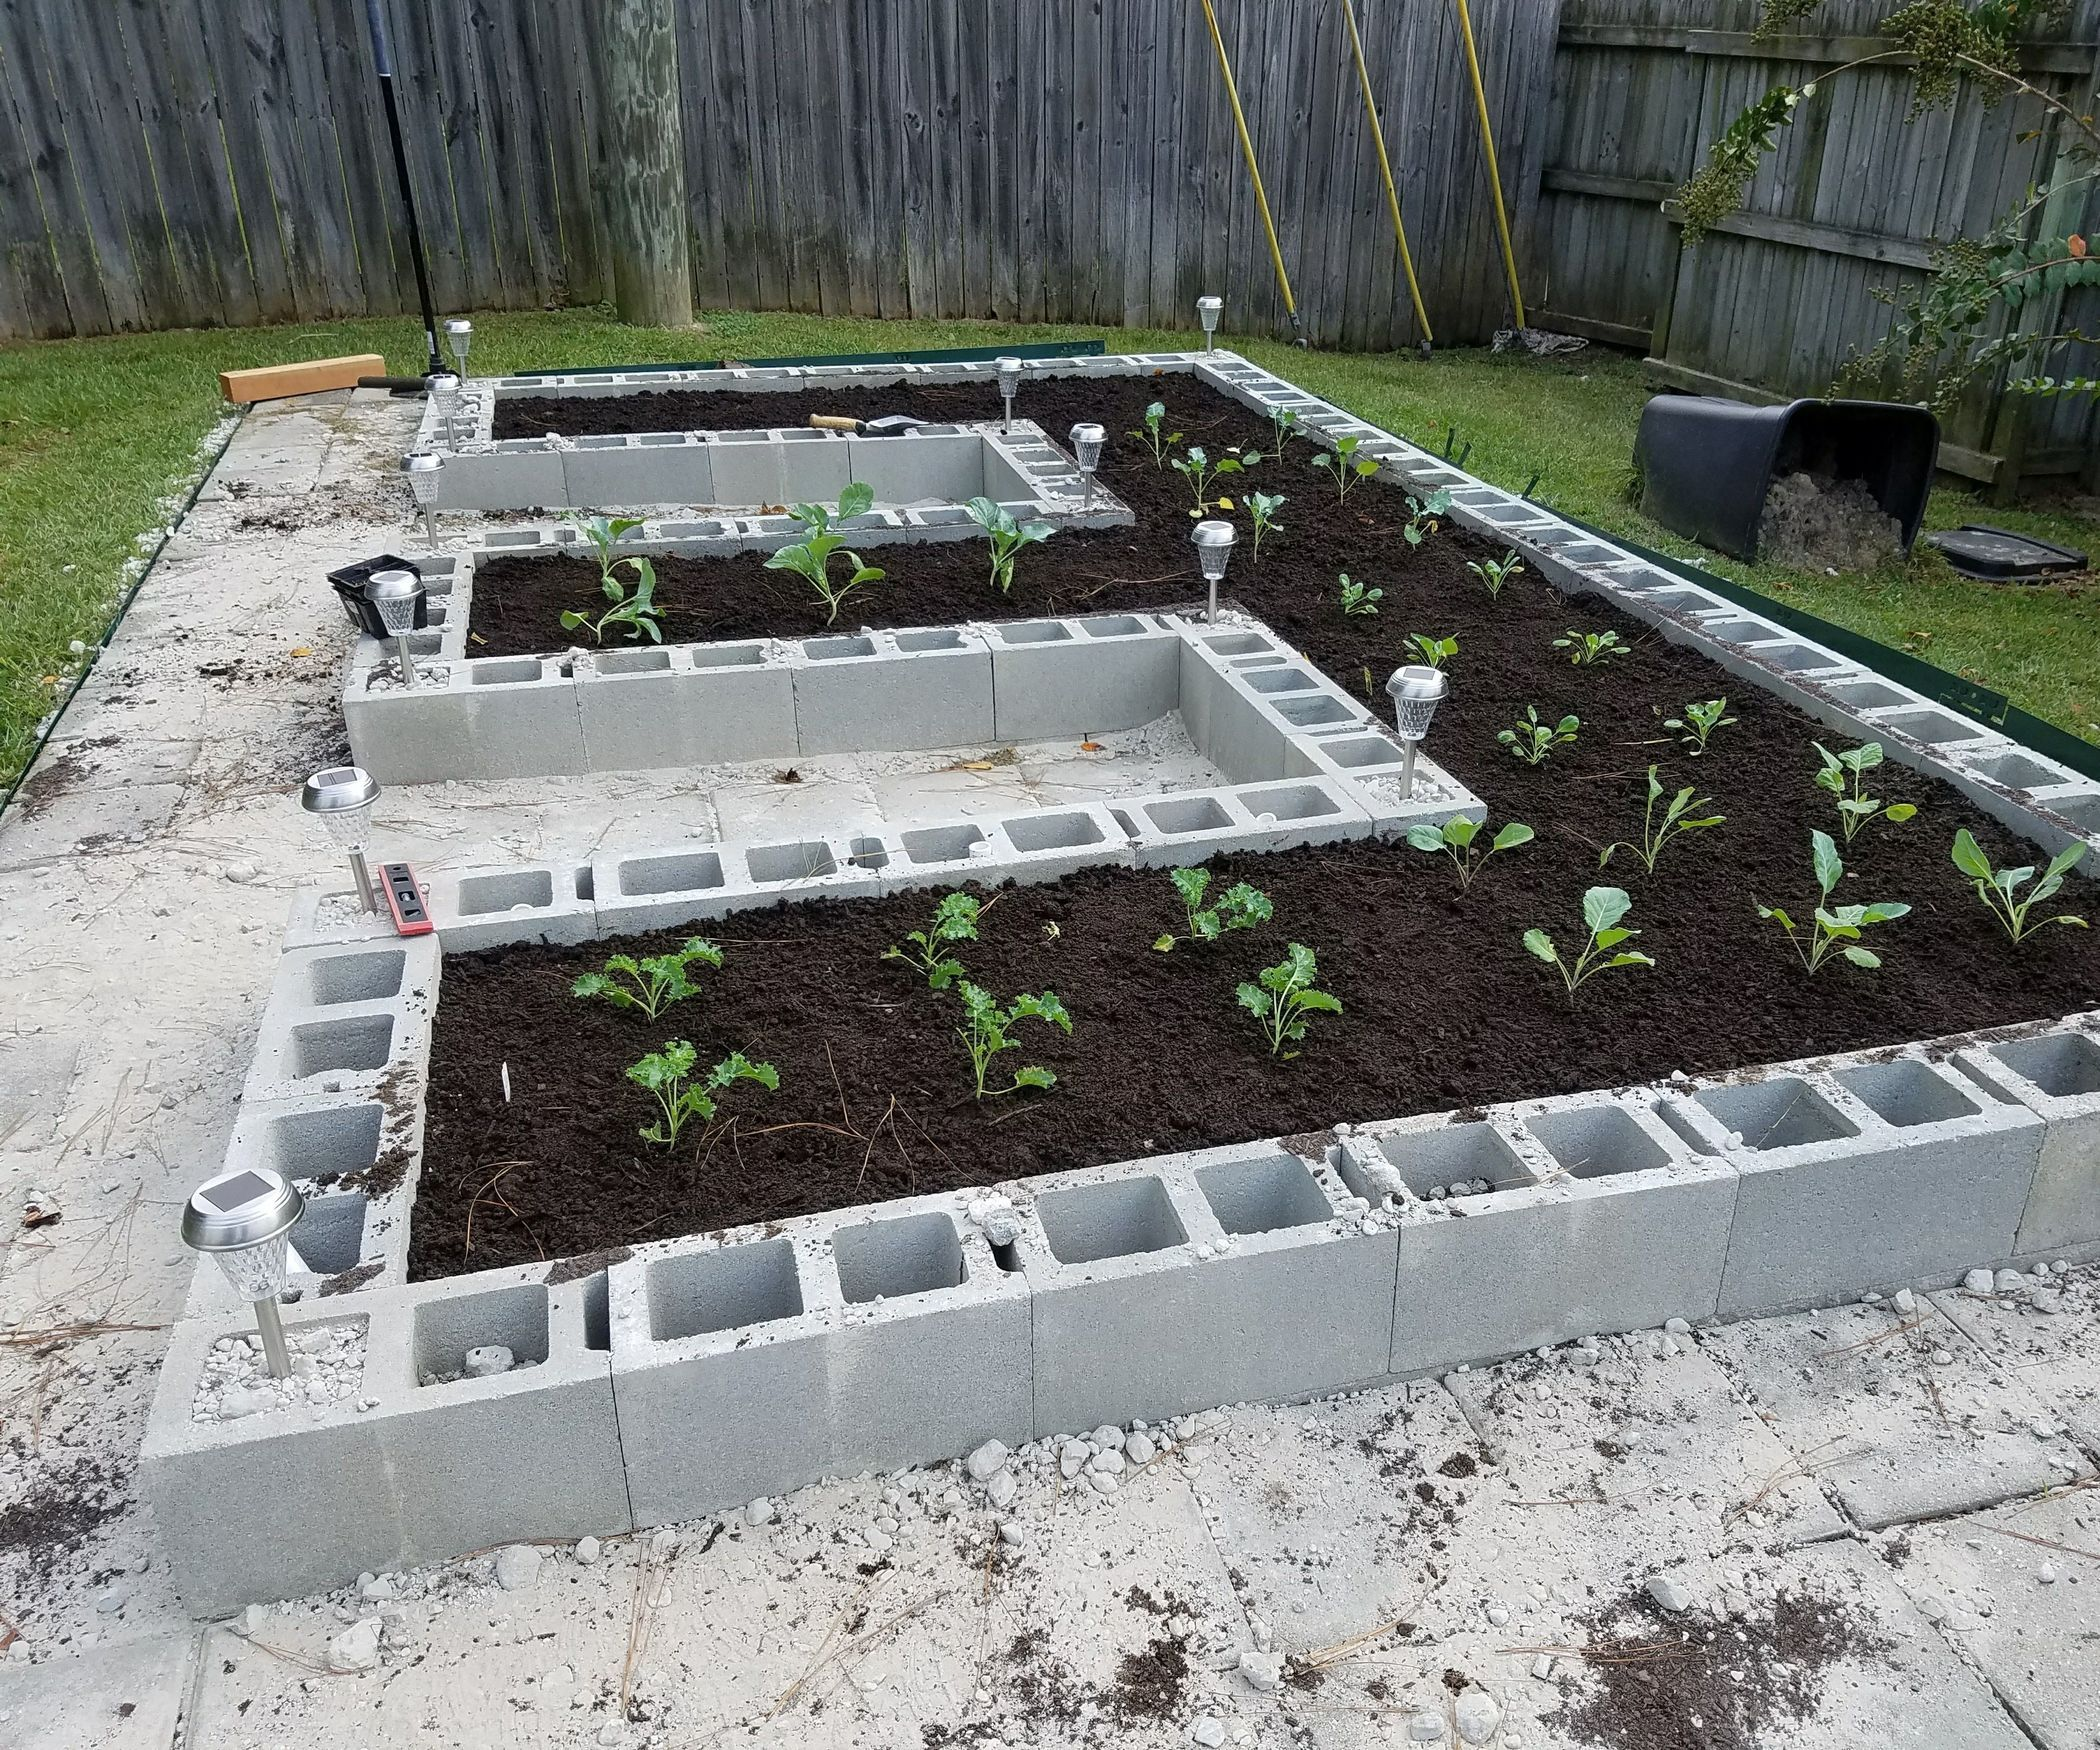 Build A Concrete Block Garden For Food And Memories Vegetable